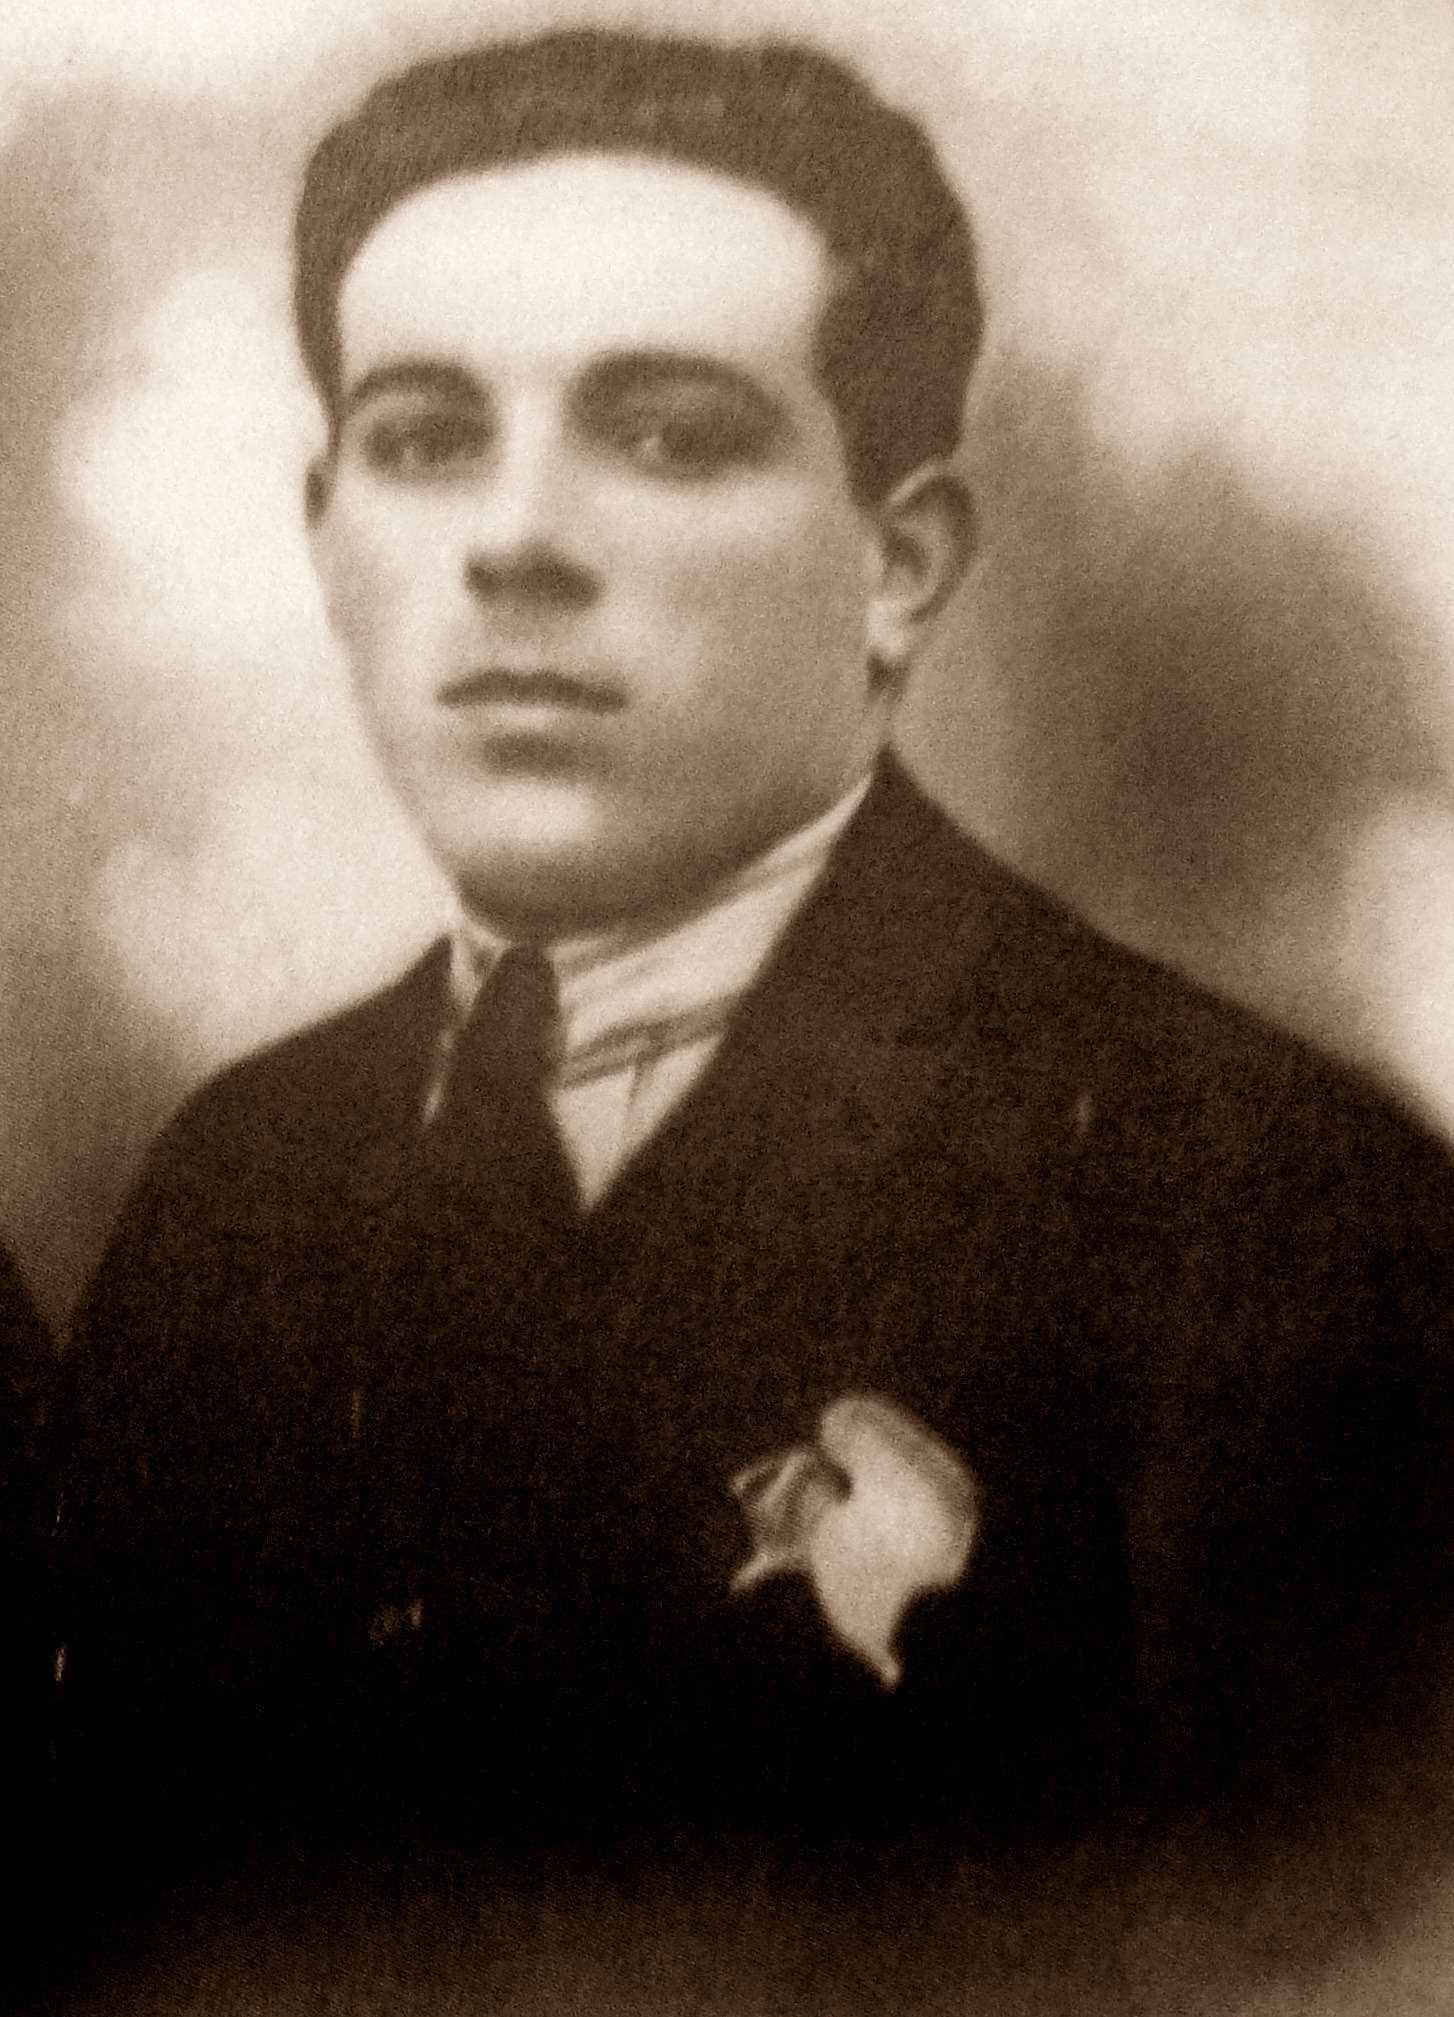 Claudio Doroteo Diéguez Loza